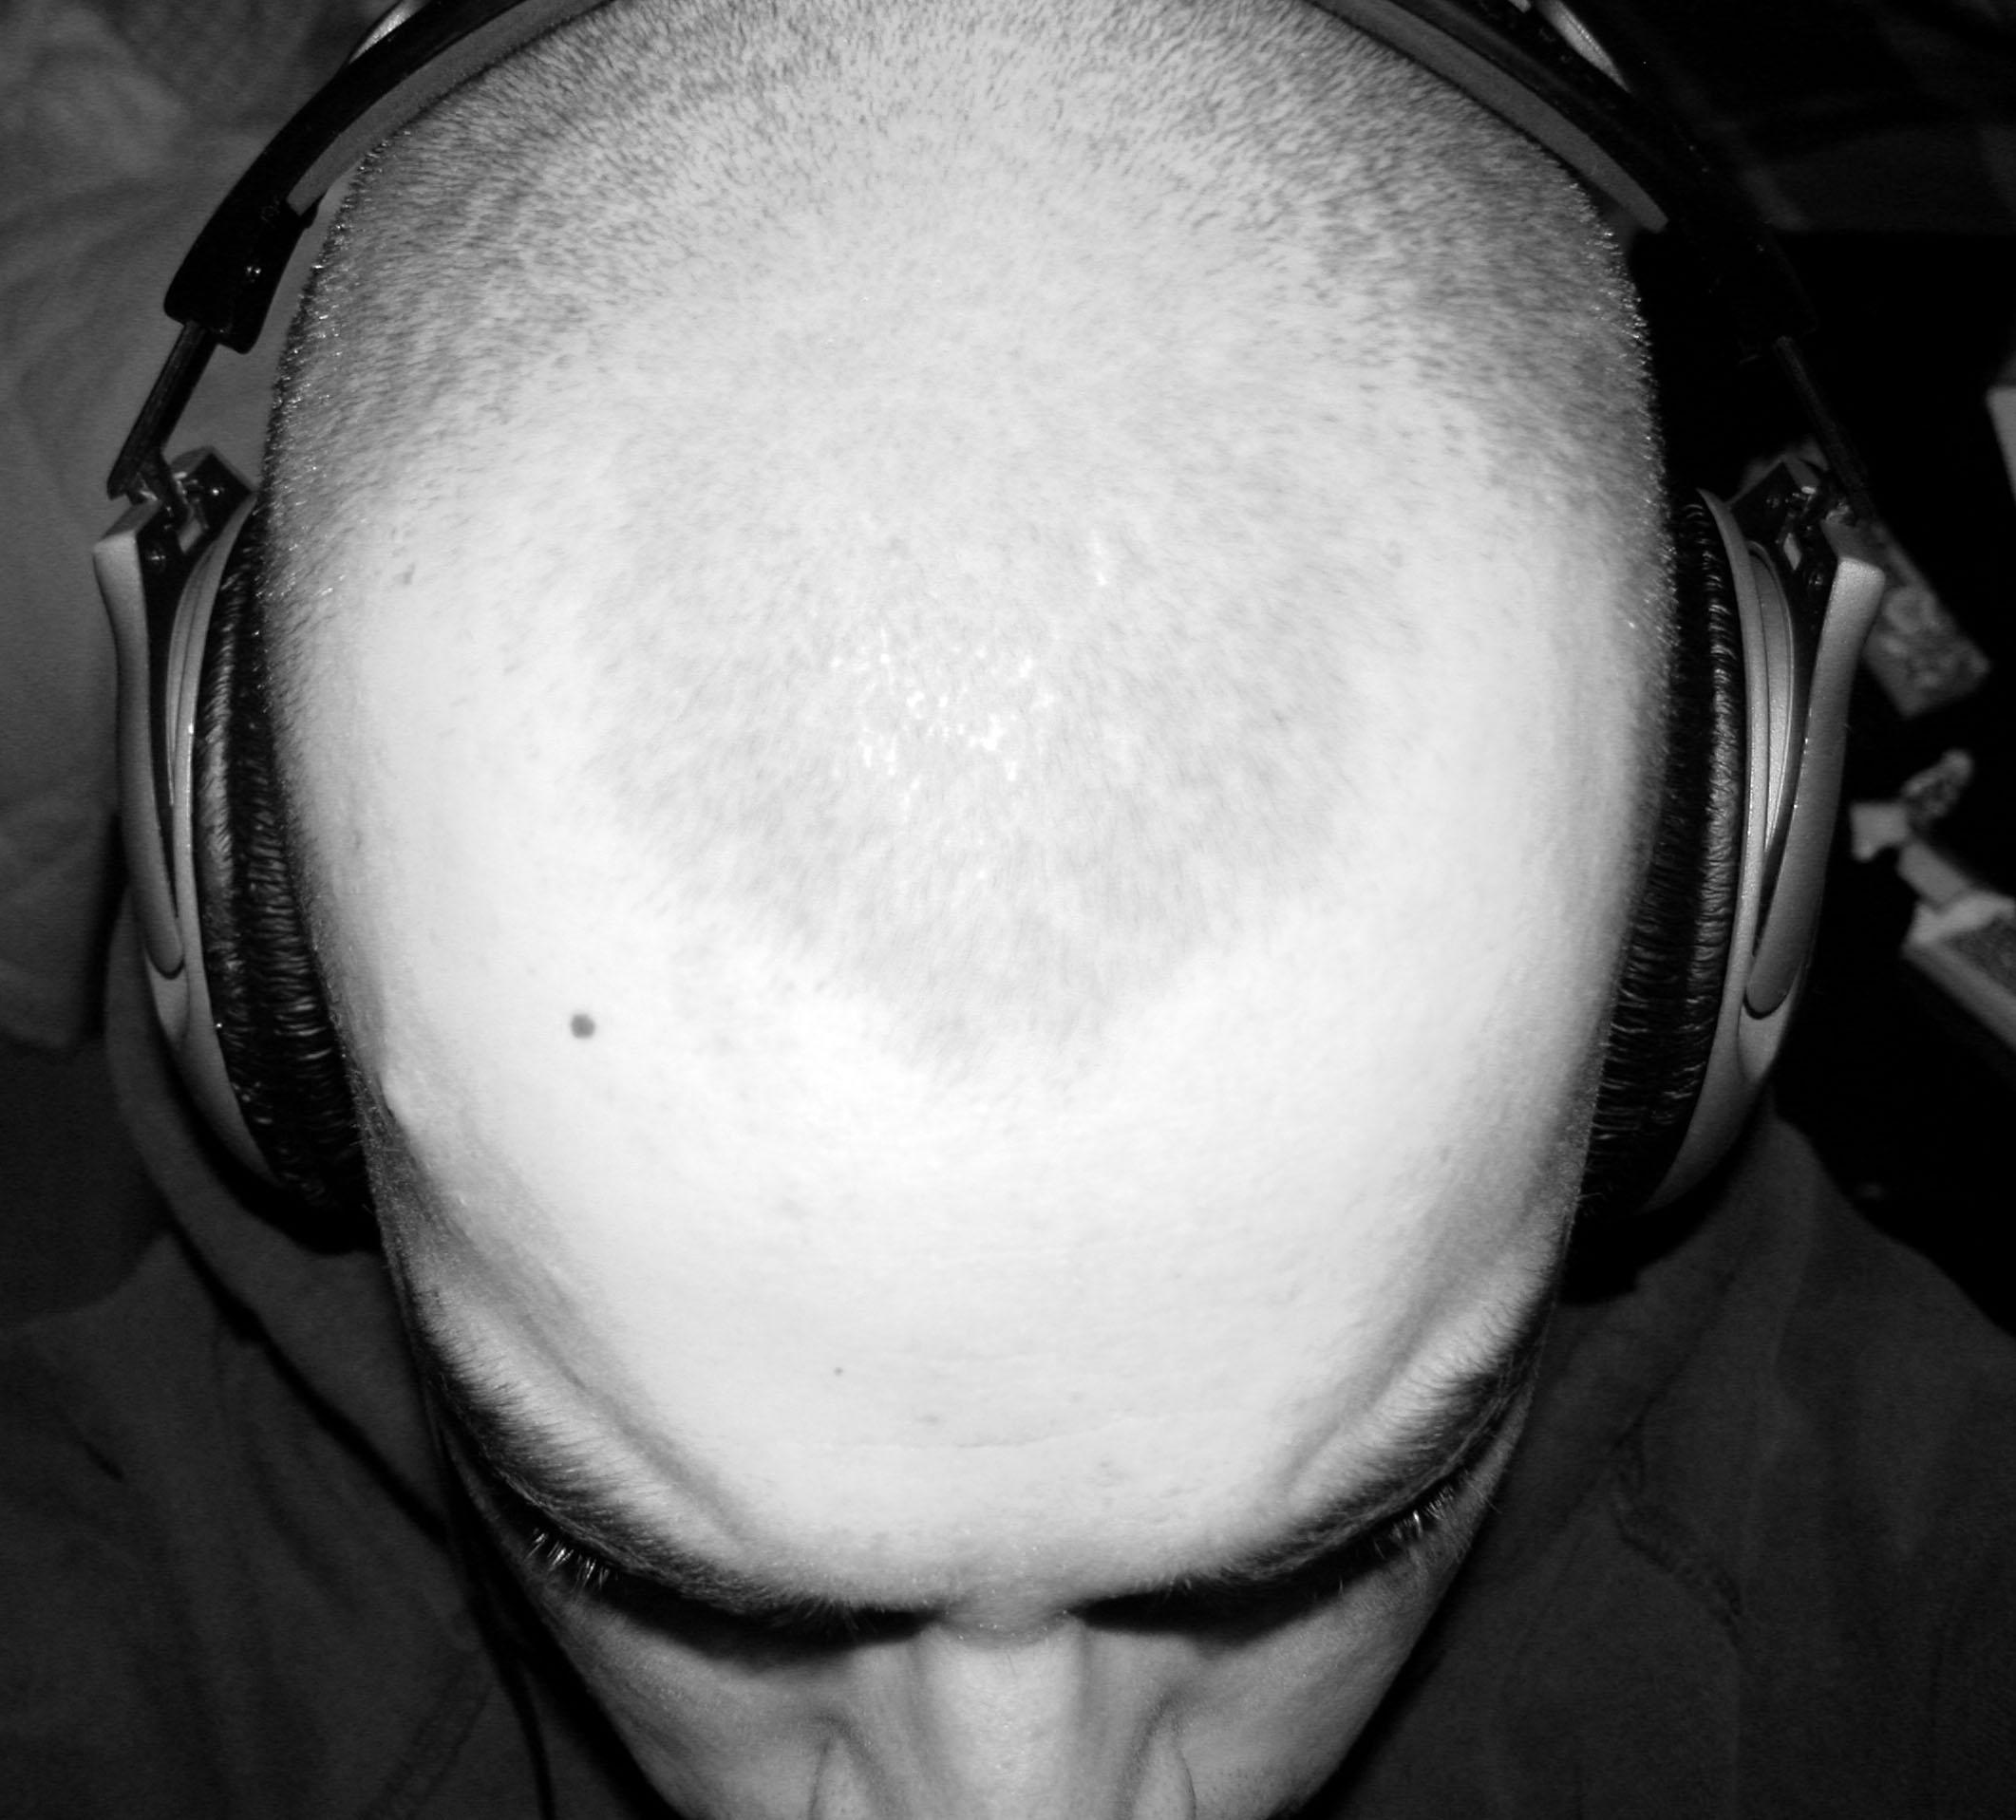 Bedre gaming med Skullcandy headset